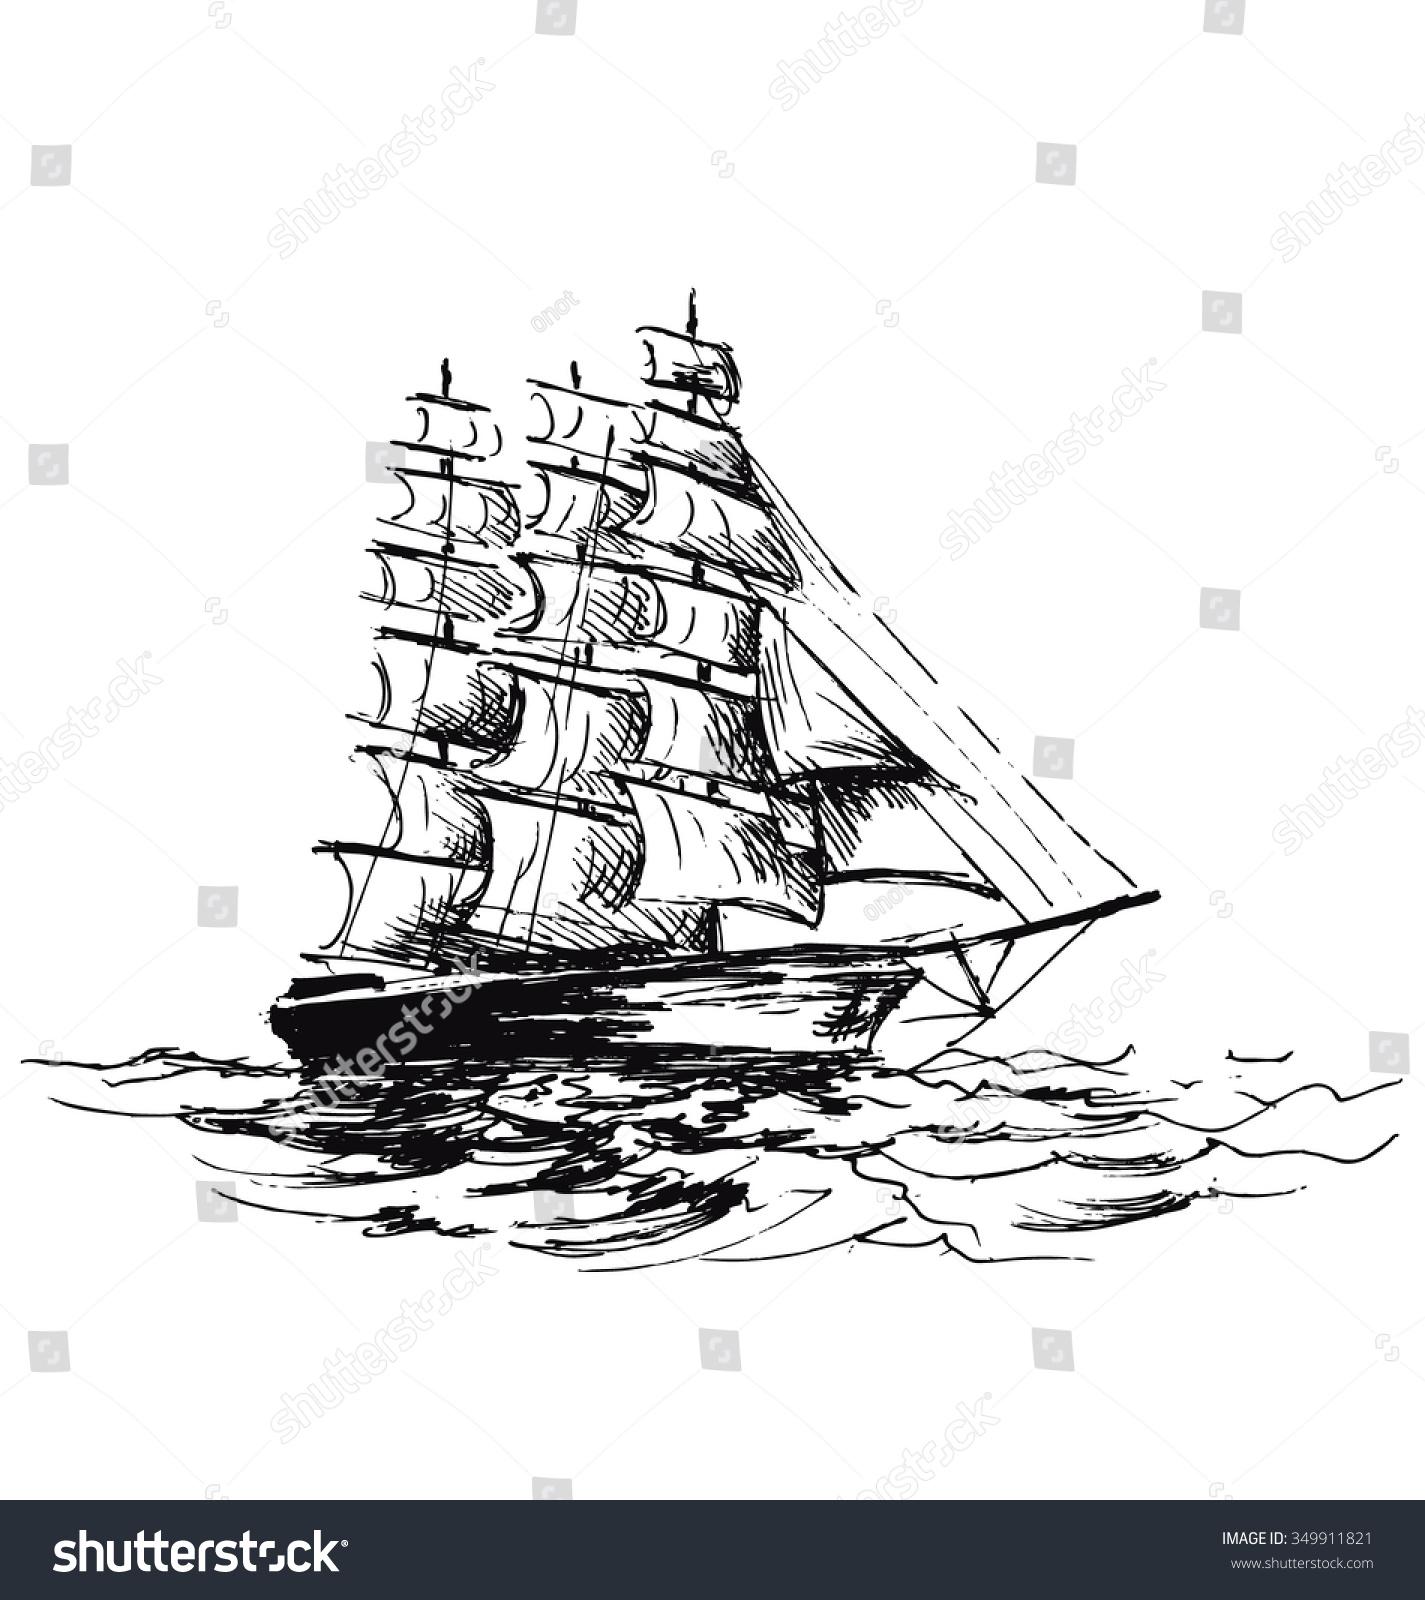 hand sketch sailboat stock vector 349911821 shutterstock